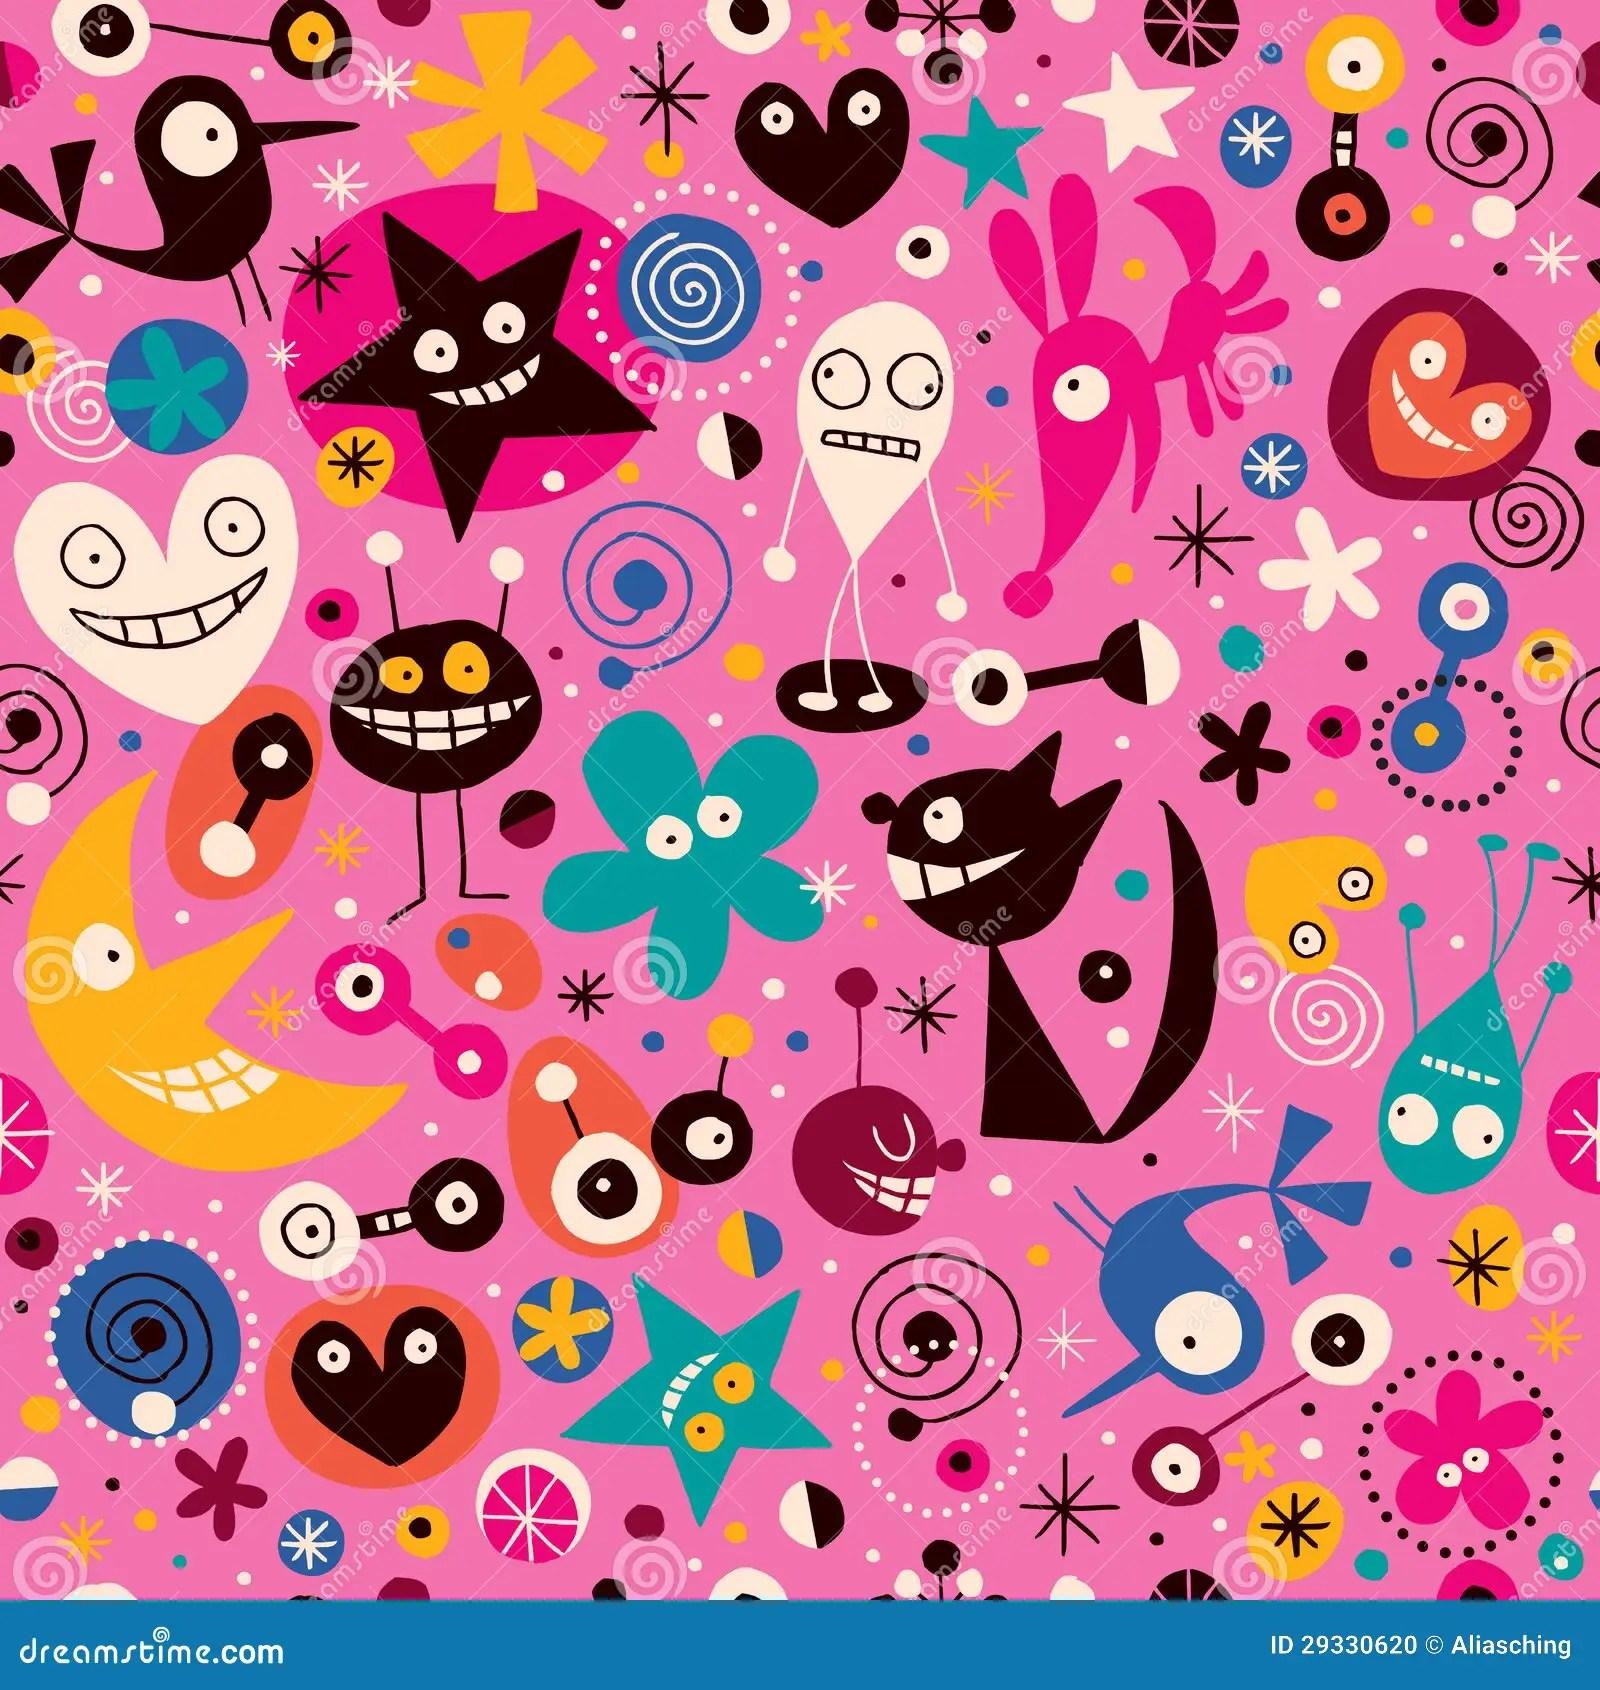 Wallpaper Cartoon Cute Pink Cartoon Pattern Stock Vector Image Of Hand Cartoon